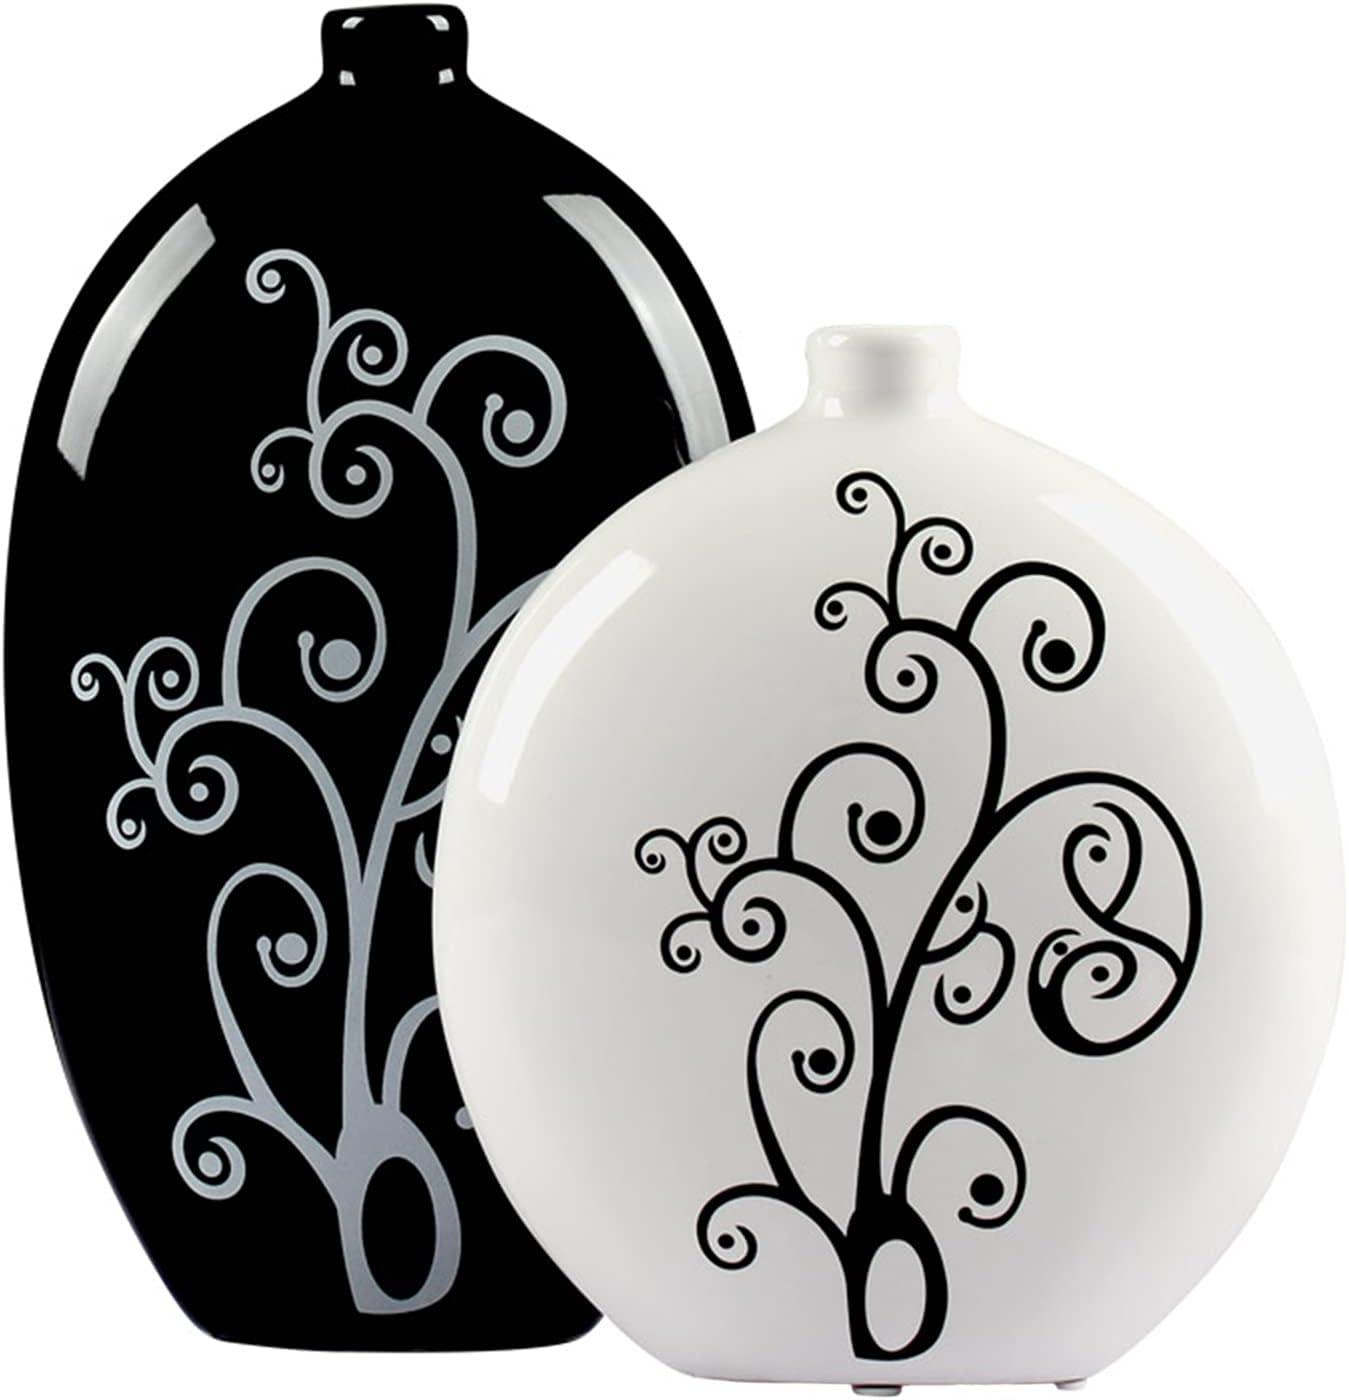 Ceramic Vase Set of 2, Modern Flower Vase, Unique Design Black and White Vases, Decorative Vase for Home Decor, Centerpieces, Living Room, Table Decor, Kitchen